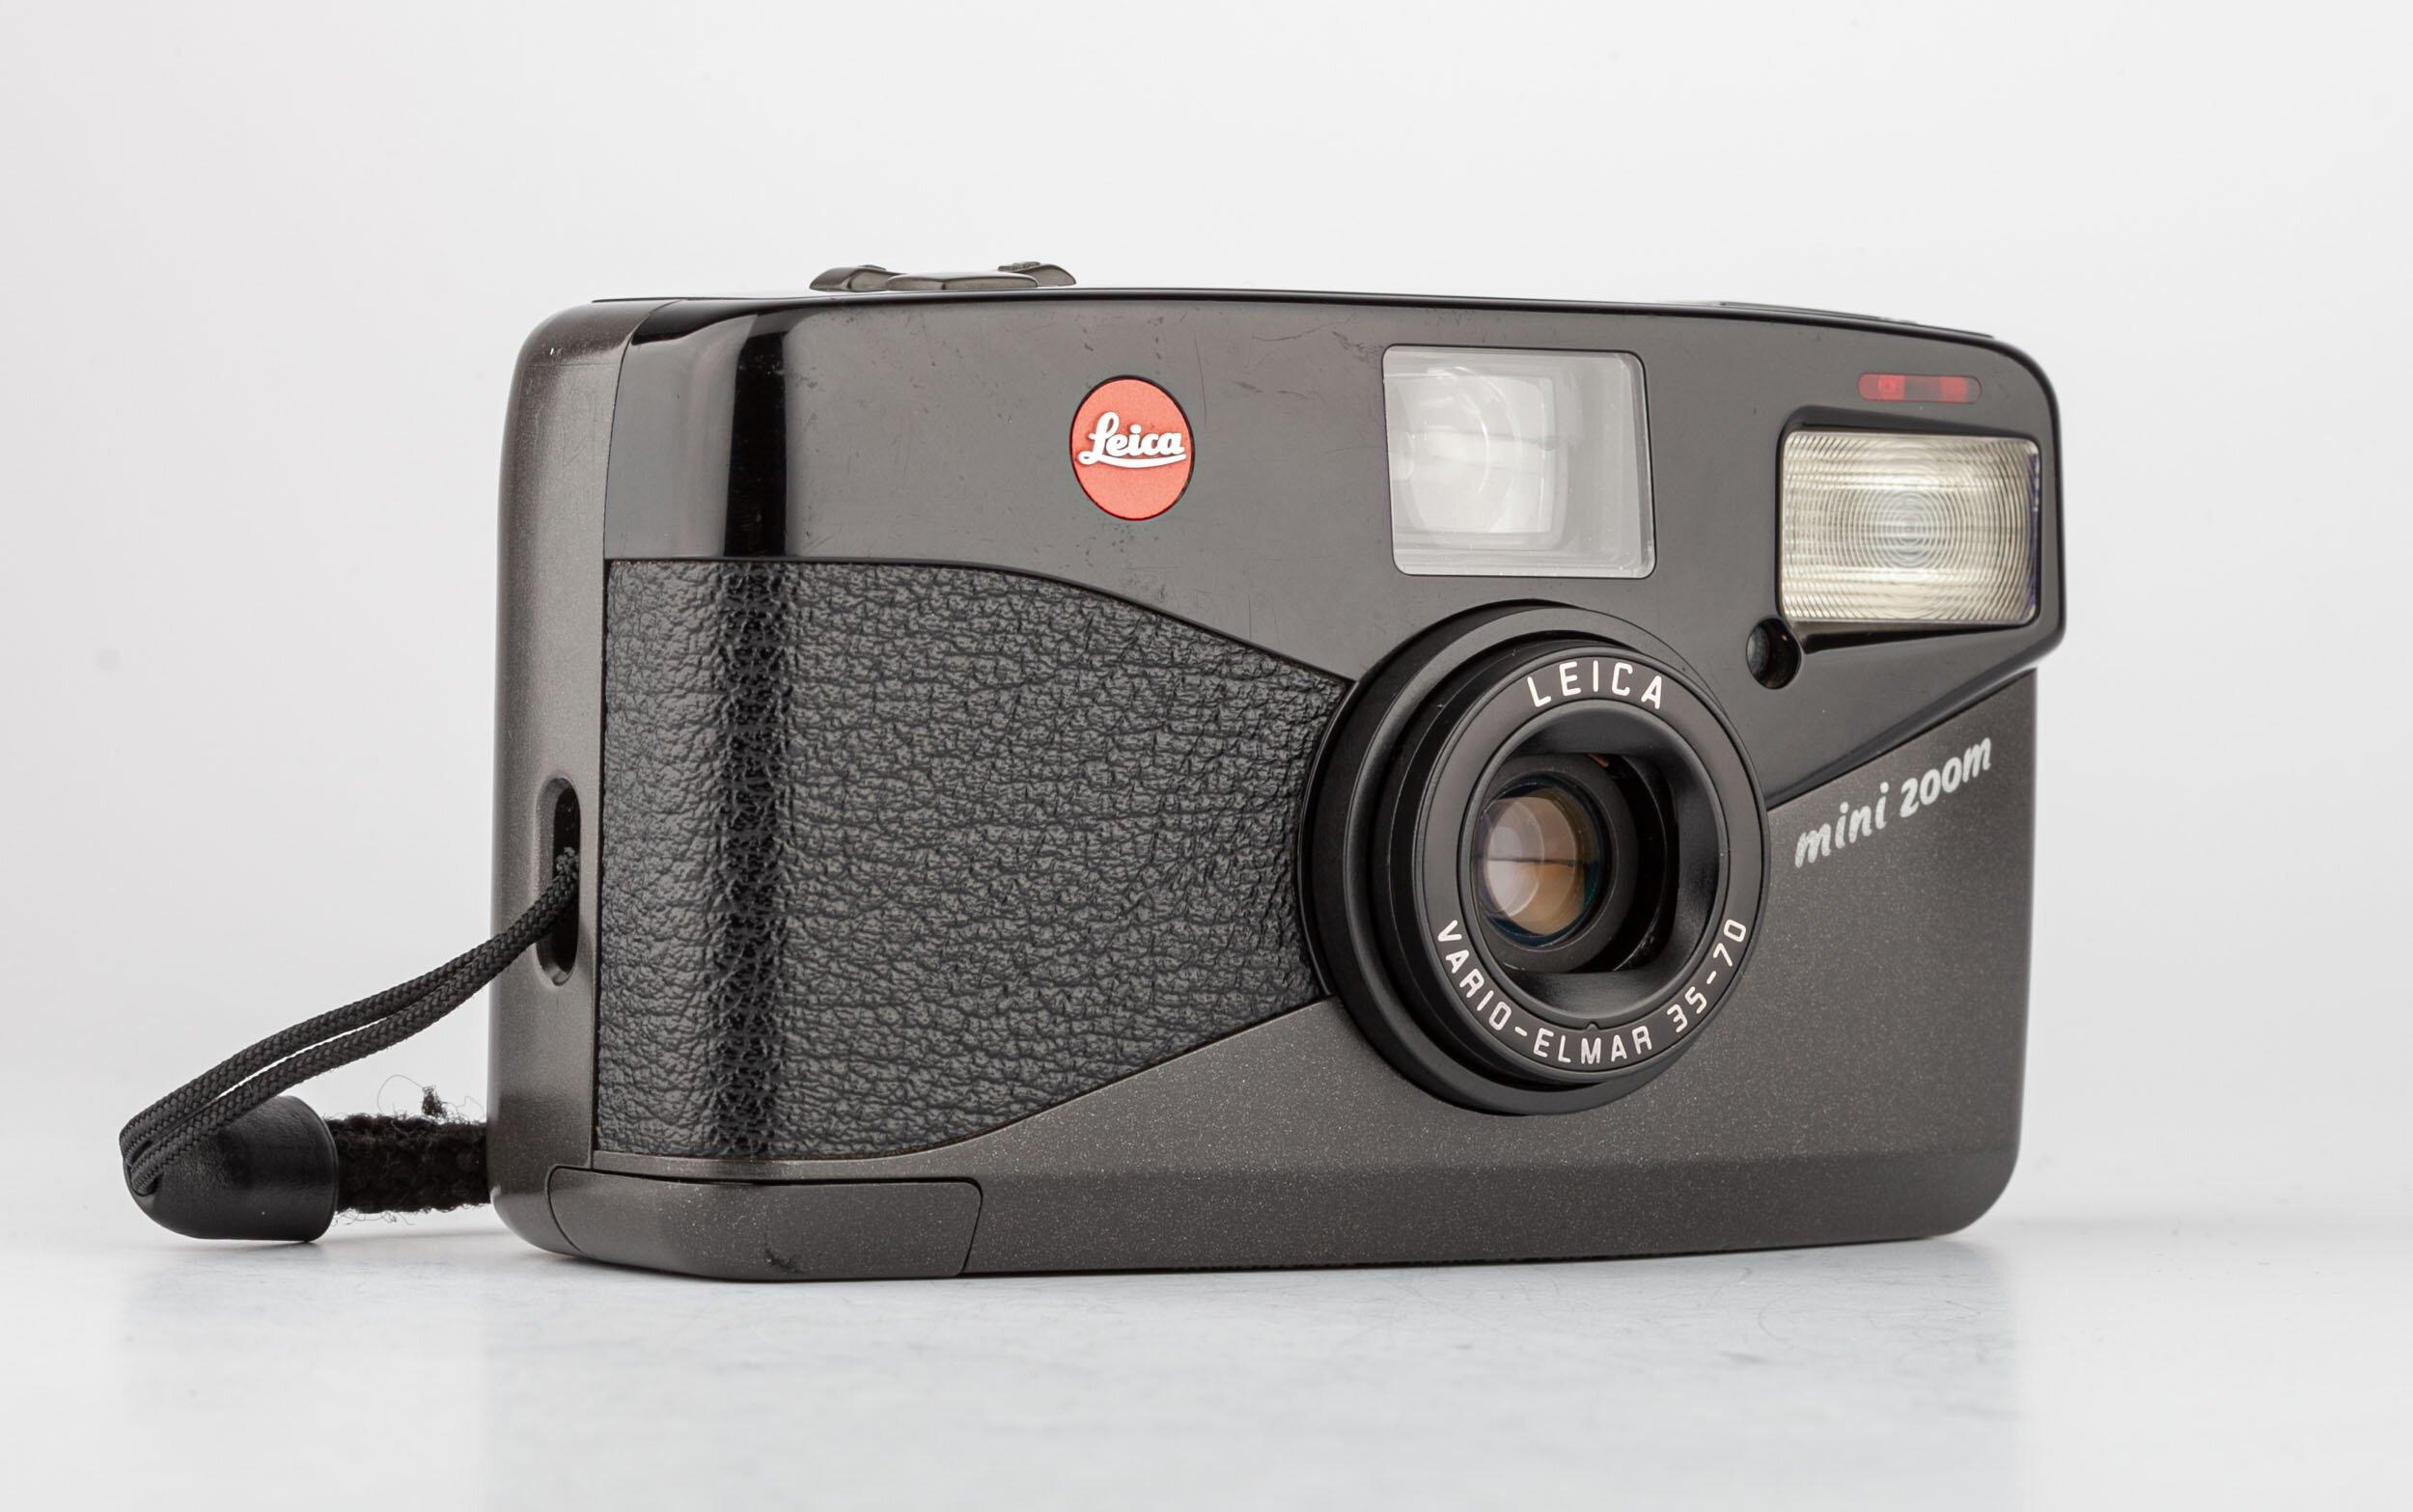 Leica mini zoom Vario-Elmar 35-70mm